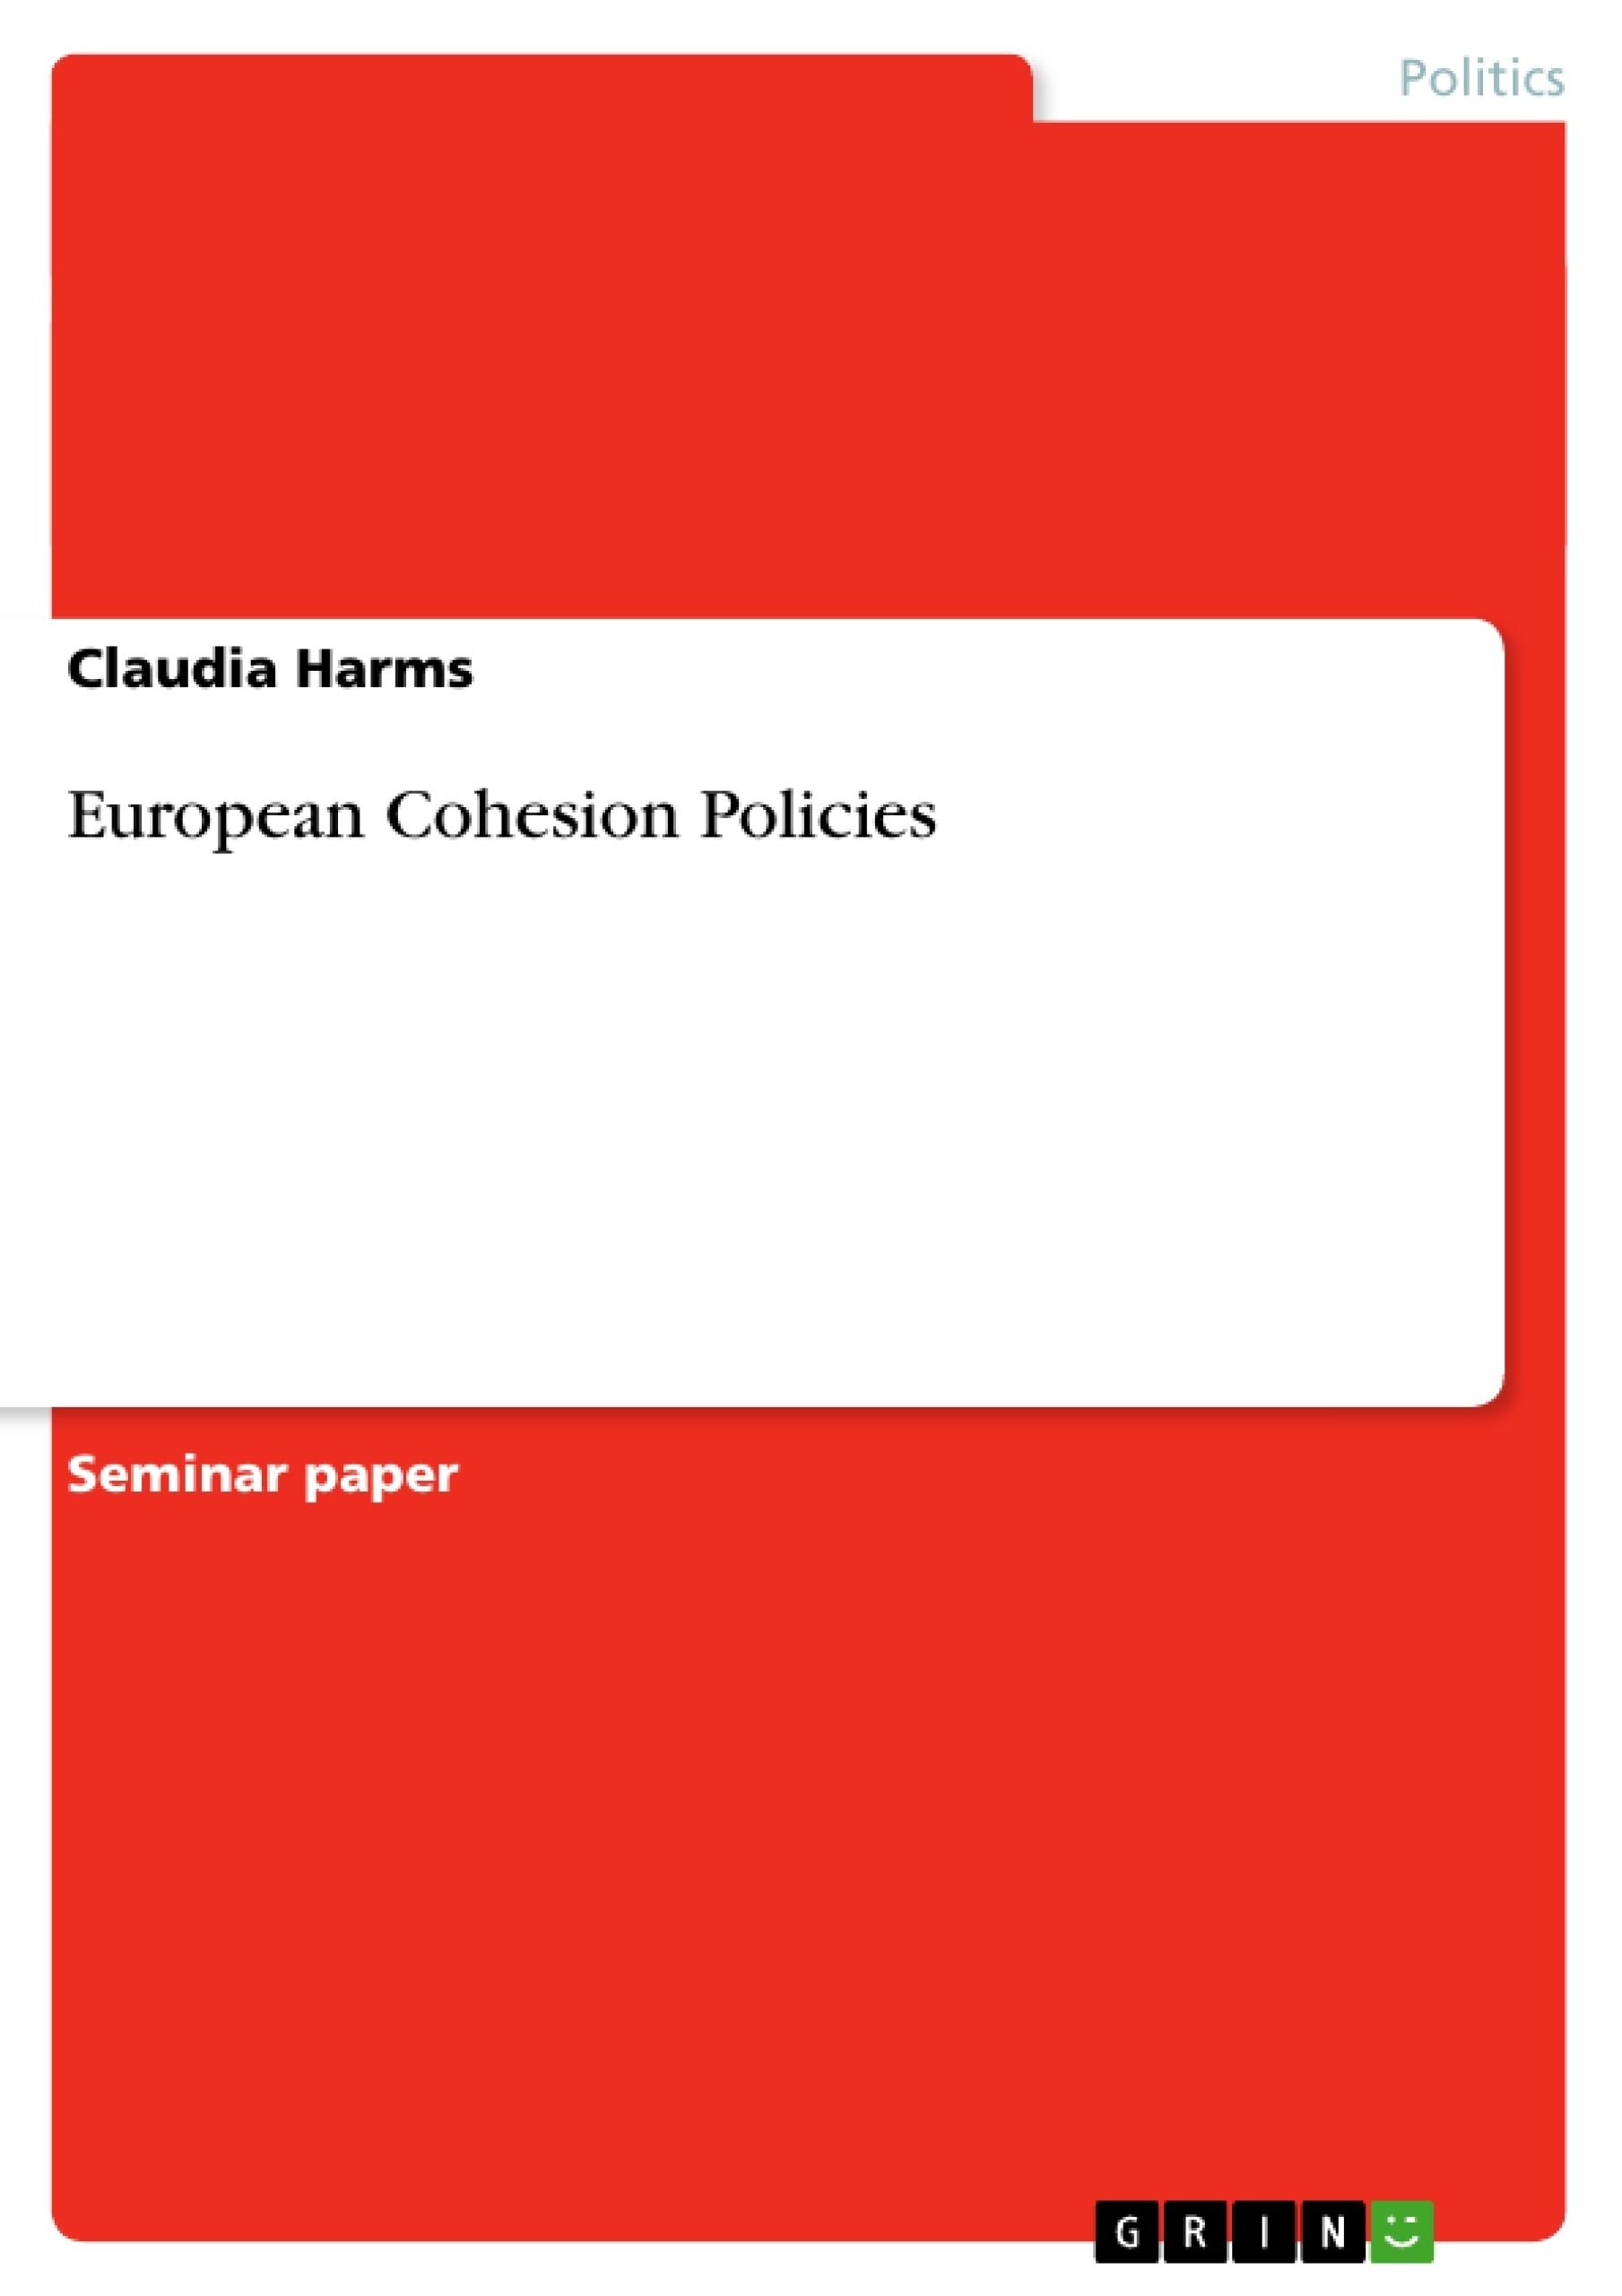 Title: European Cohesion Policies